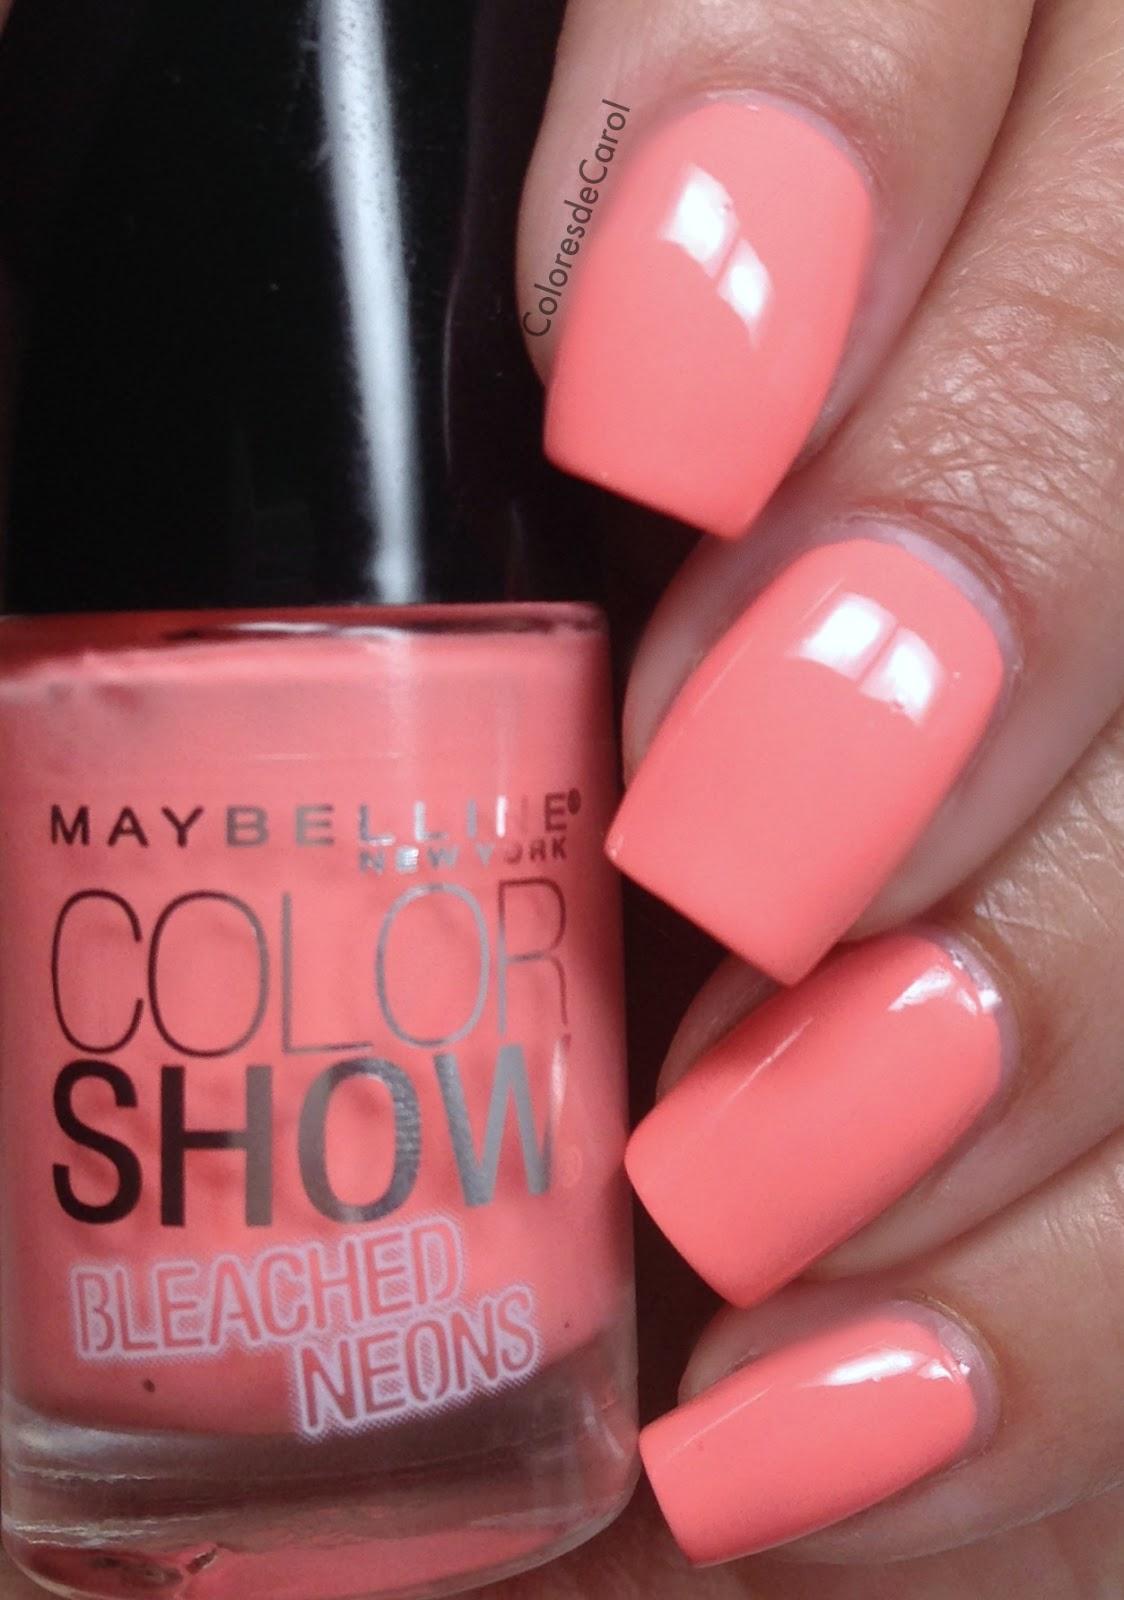 Colores de Carol: Maybelline Bleached Neons